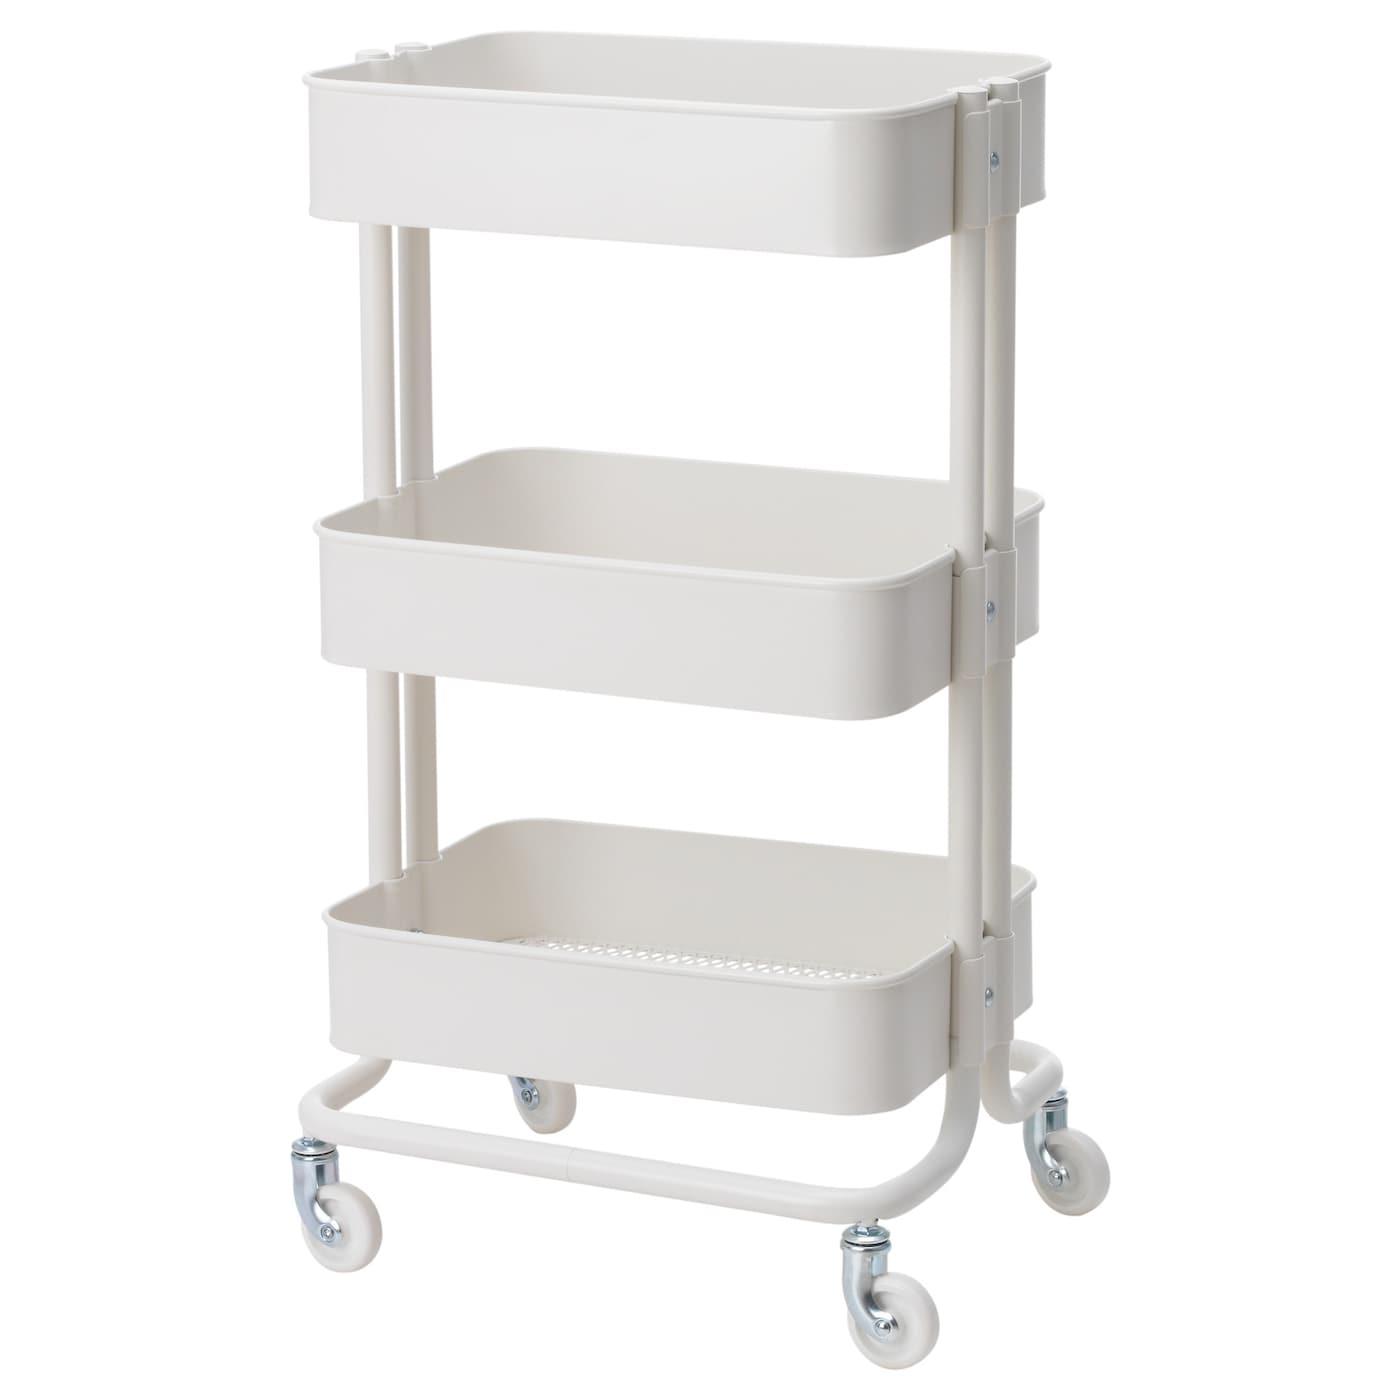 "RÅSKOG Utility cart, white, 13 3/4x17 3/4x30 3/4 "" - Perfect for Ikea classroom"